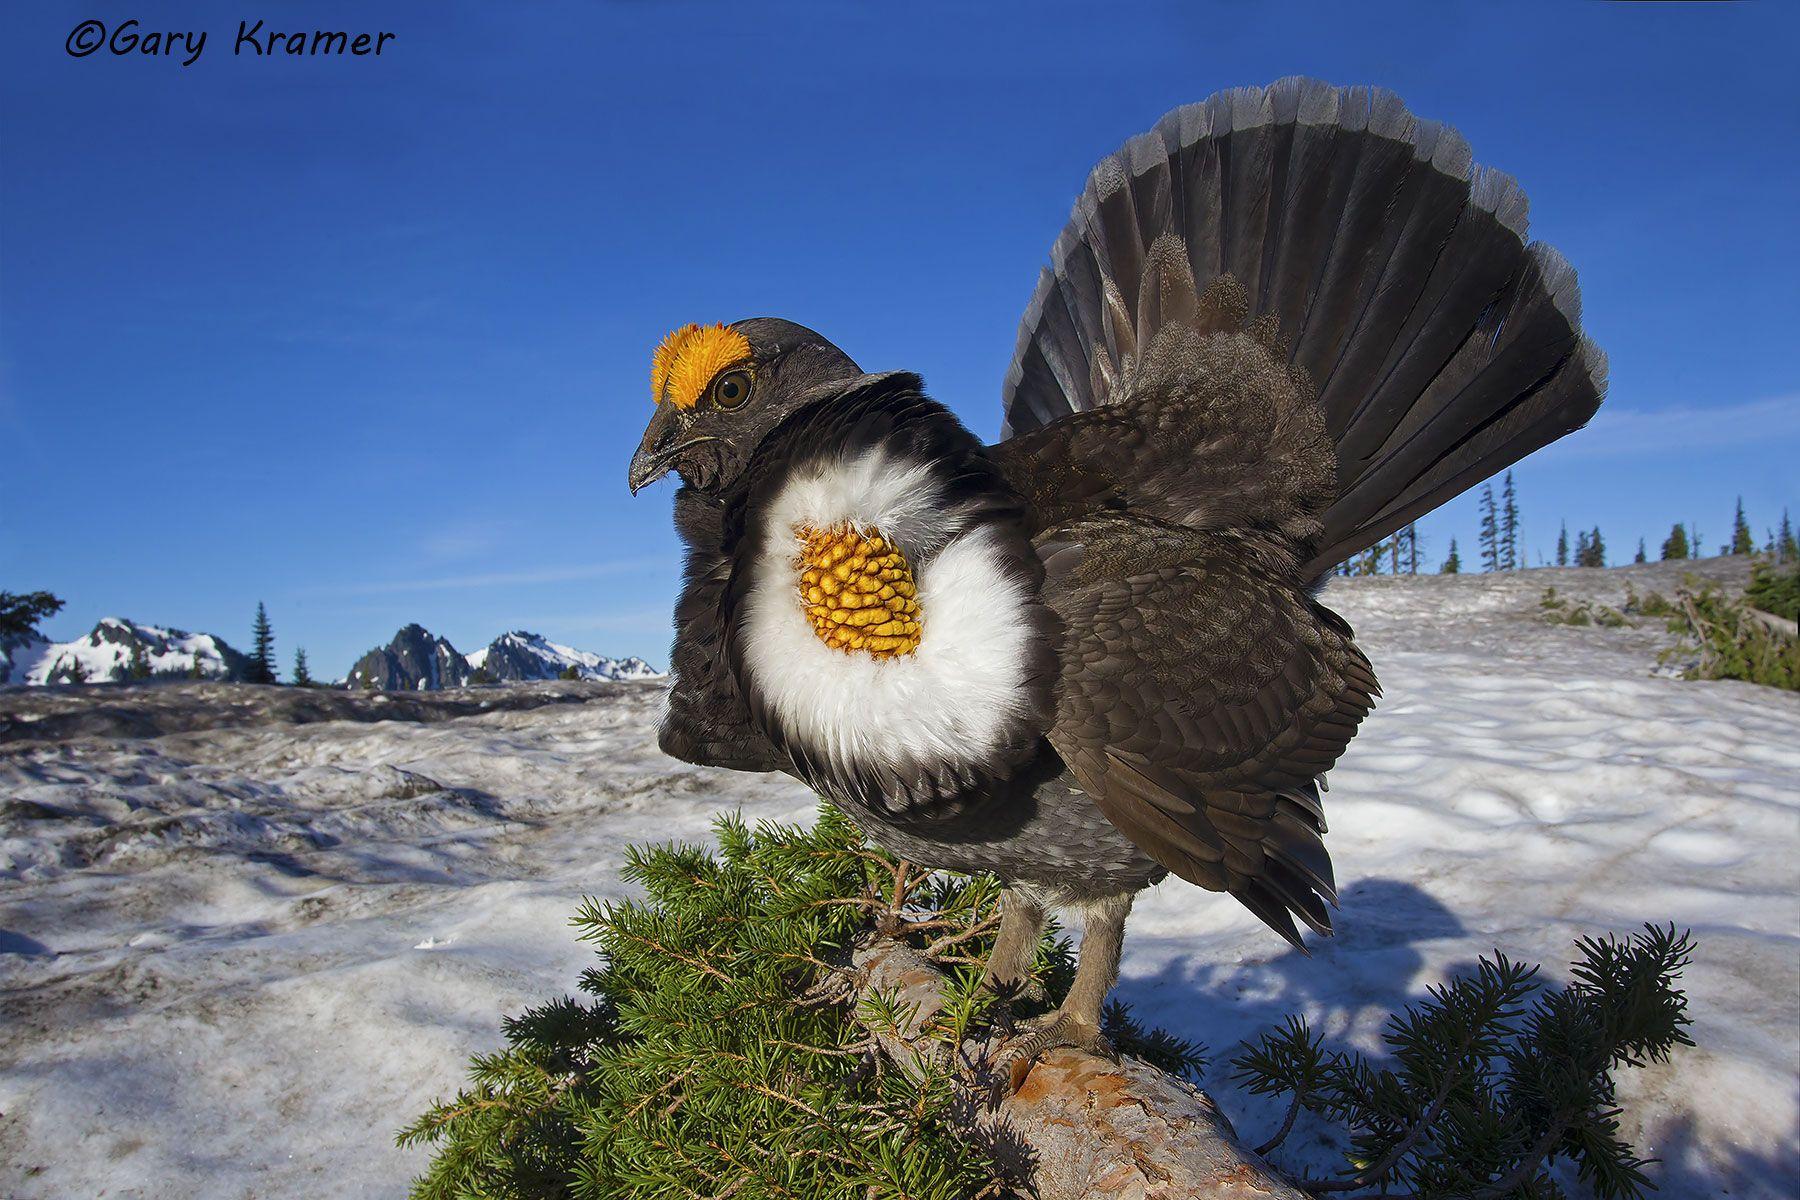 Sooty Grouse (Dendragapus fuliginosus) - NBGsf#1151d